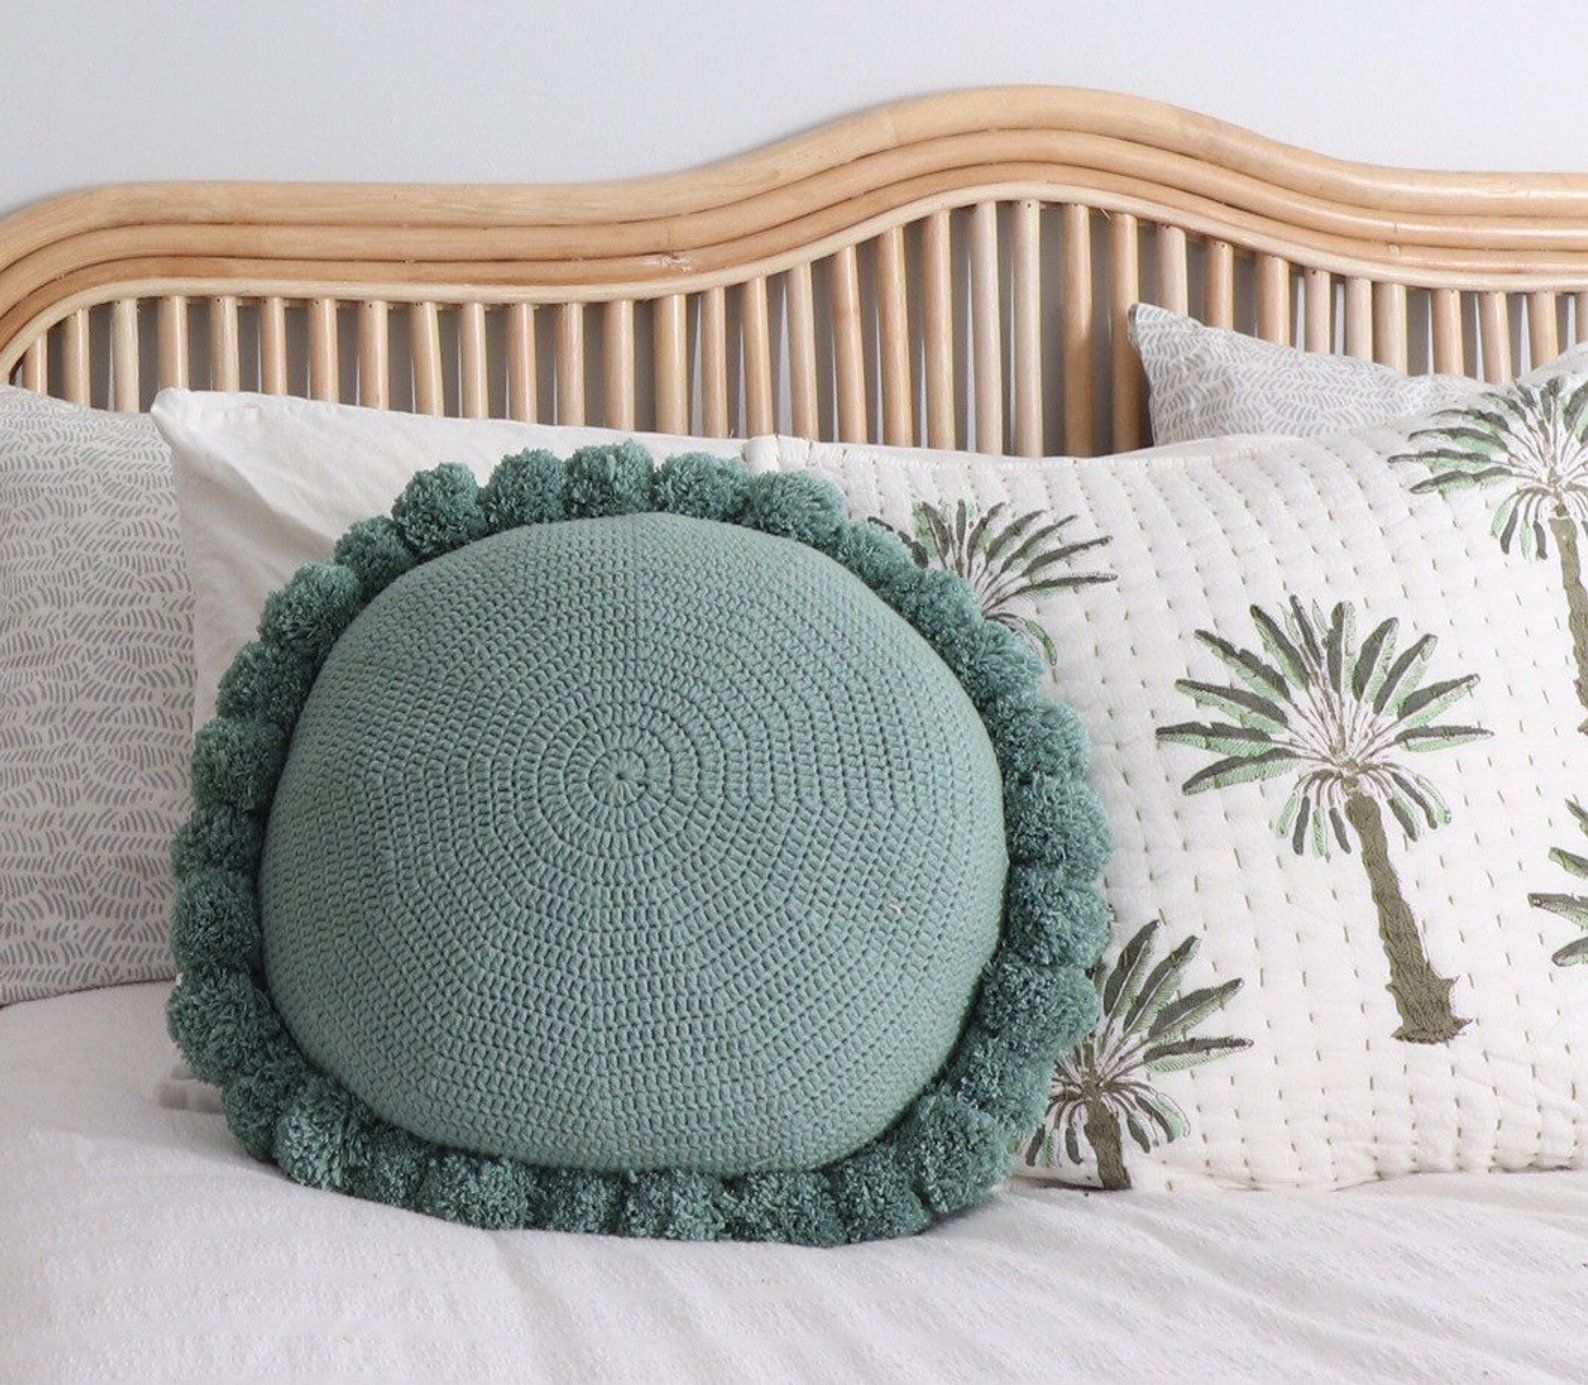 100 cotton round pom pom cushion